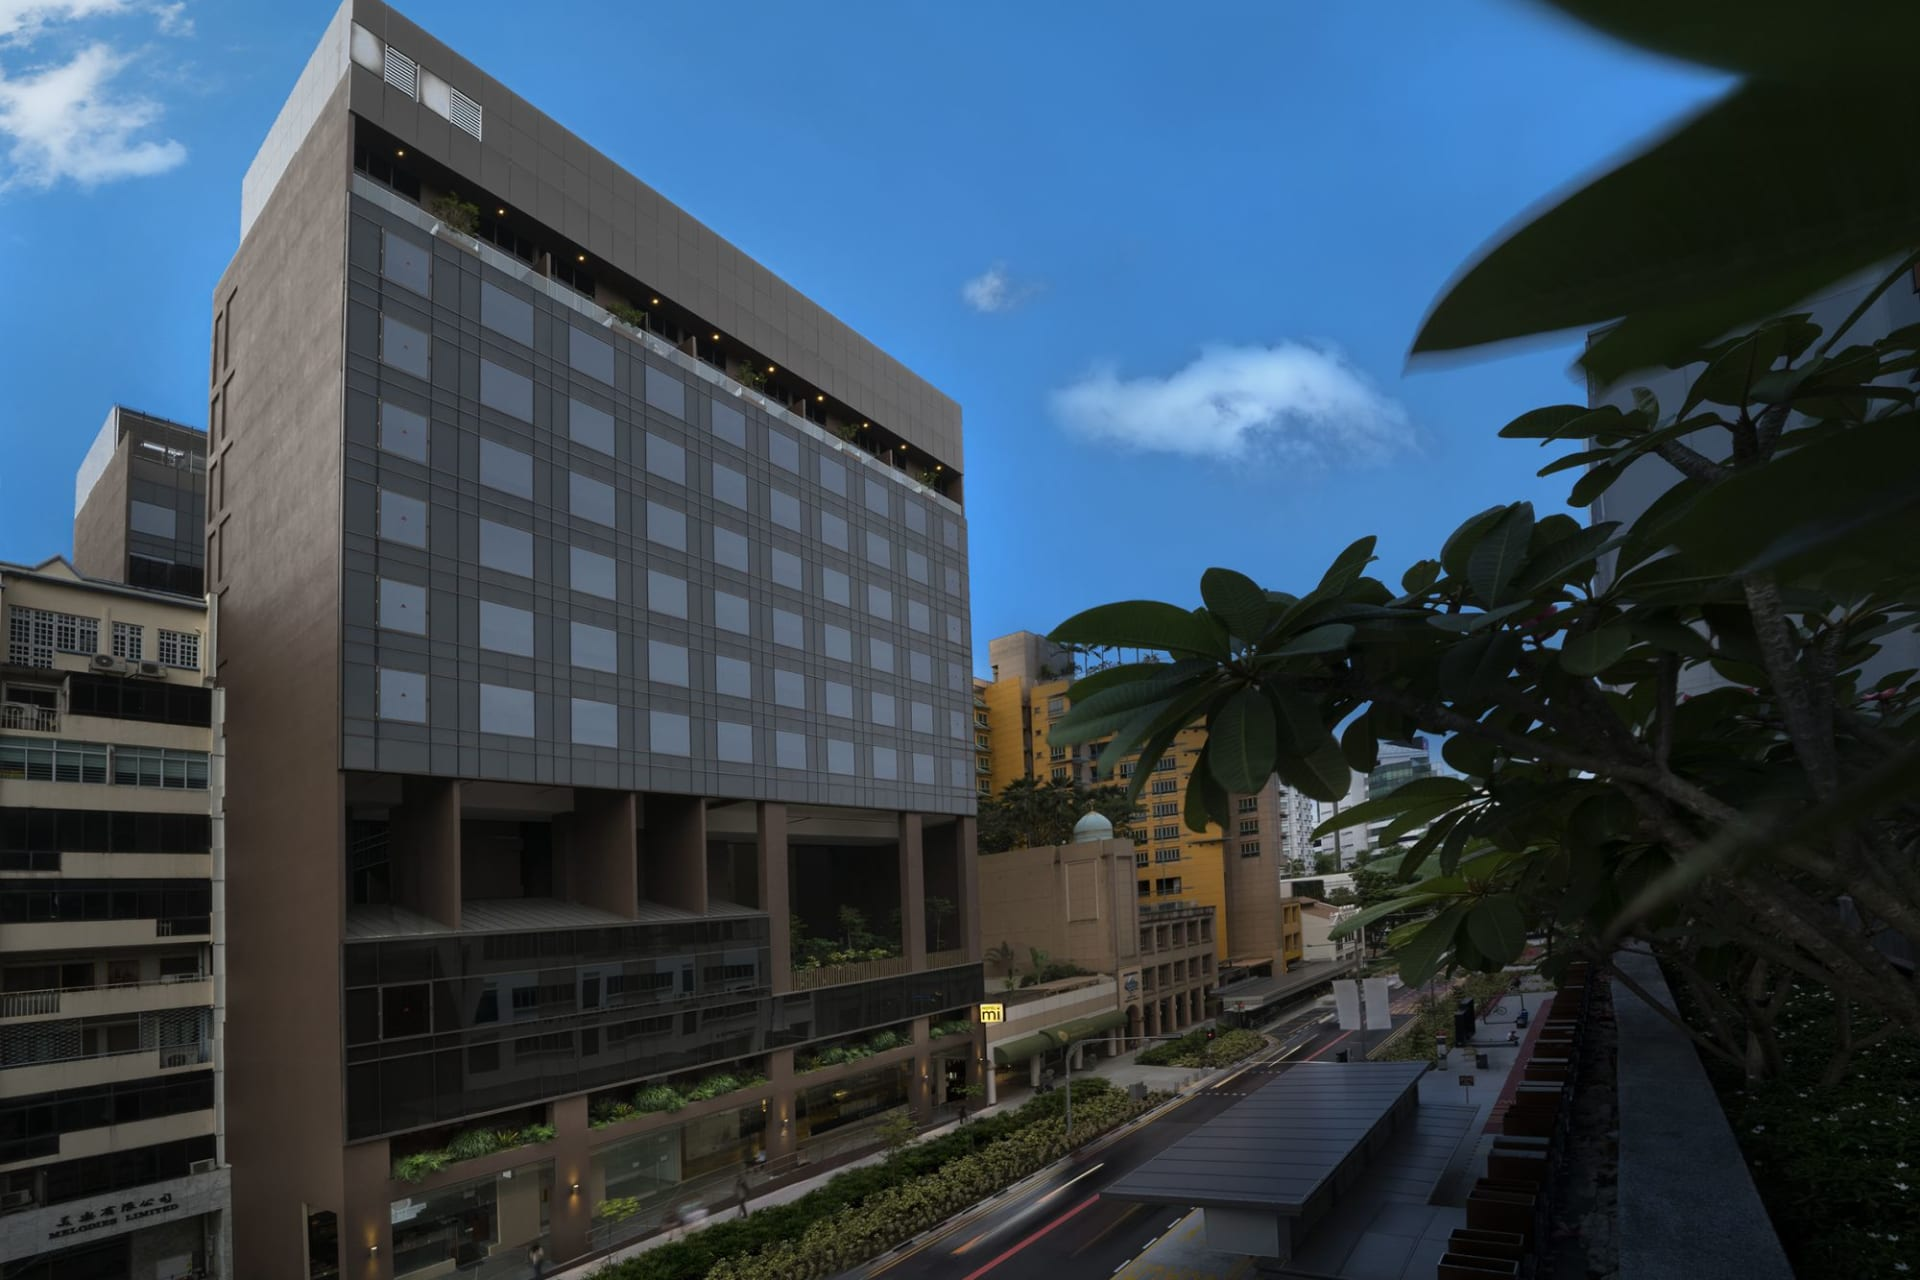 exterior: Hotel building